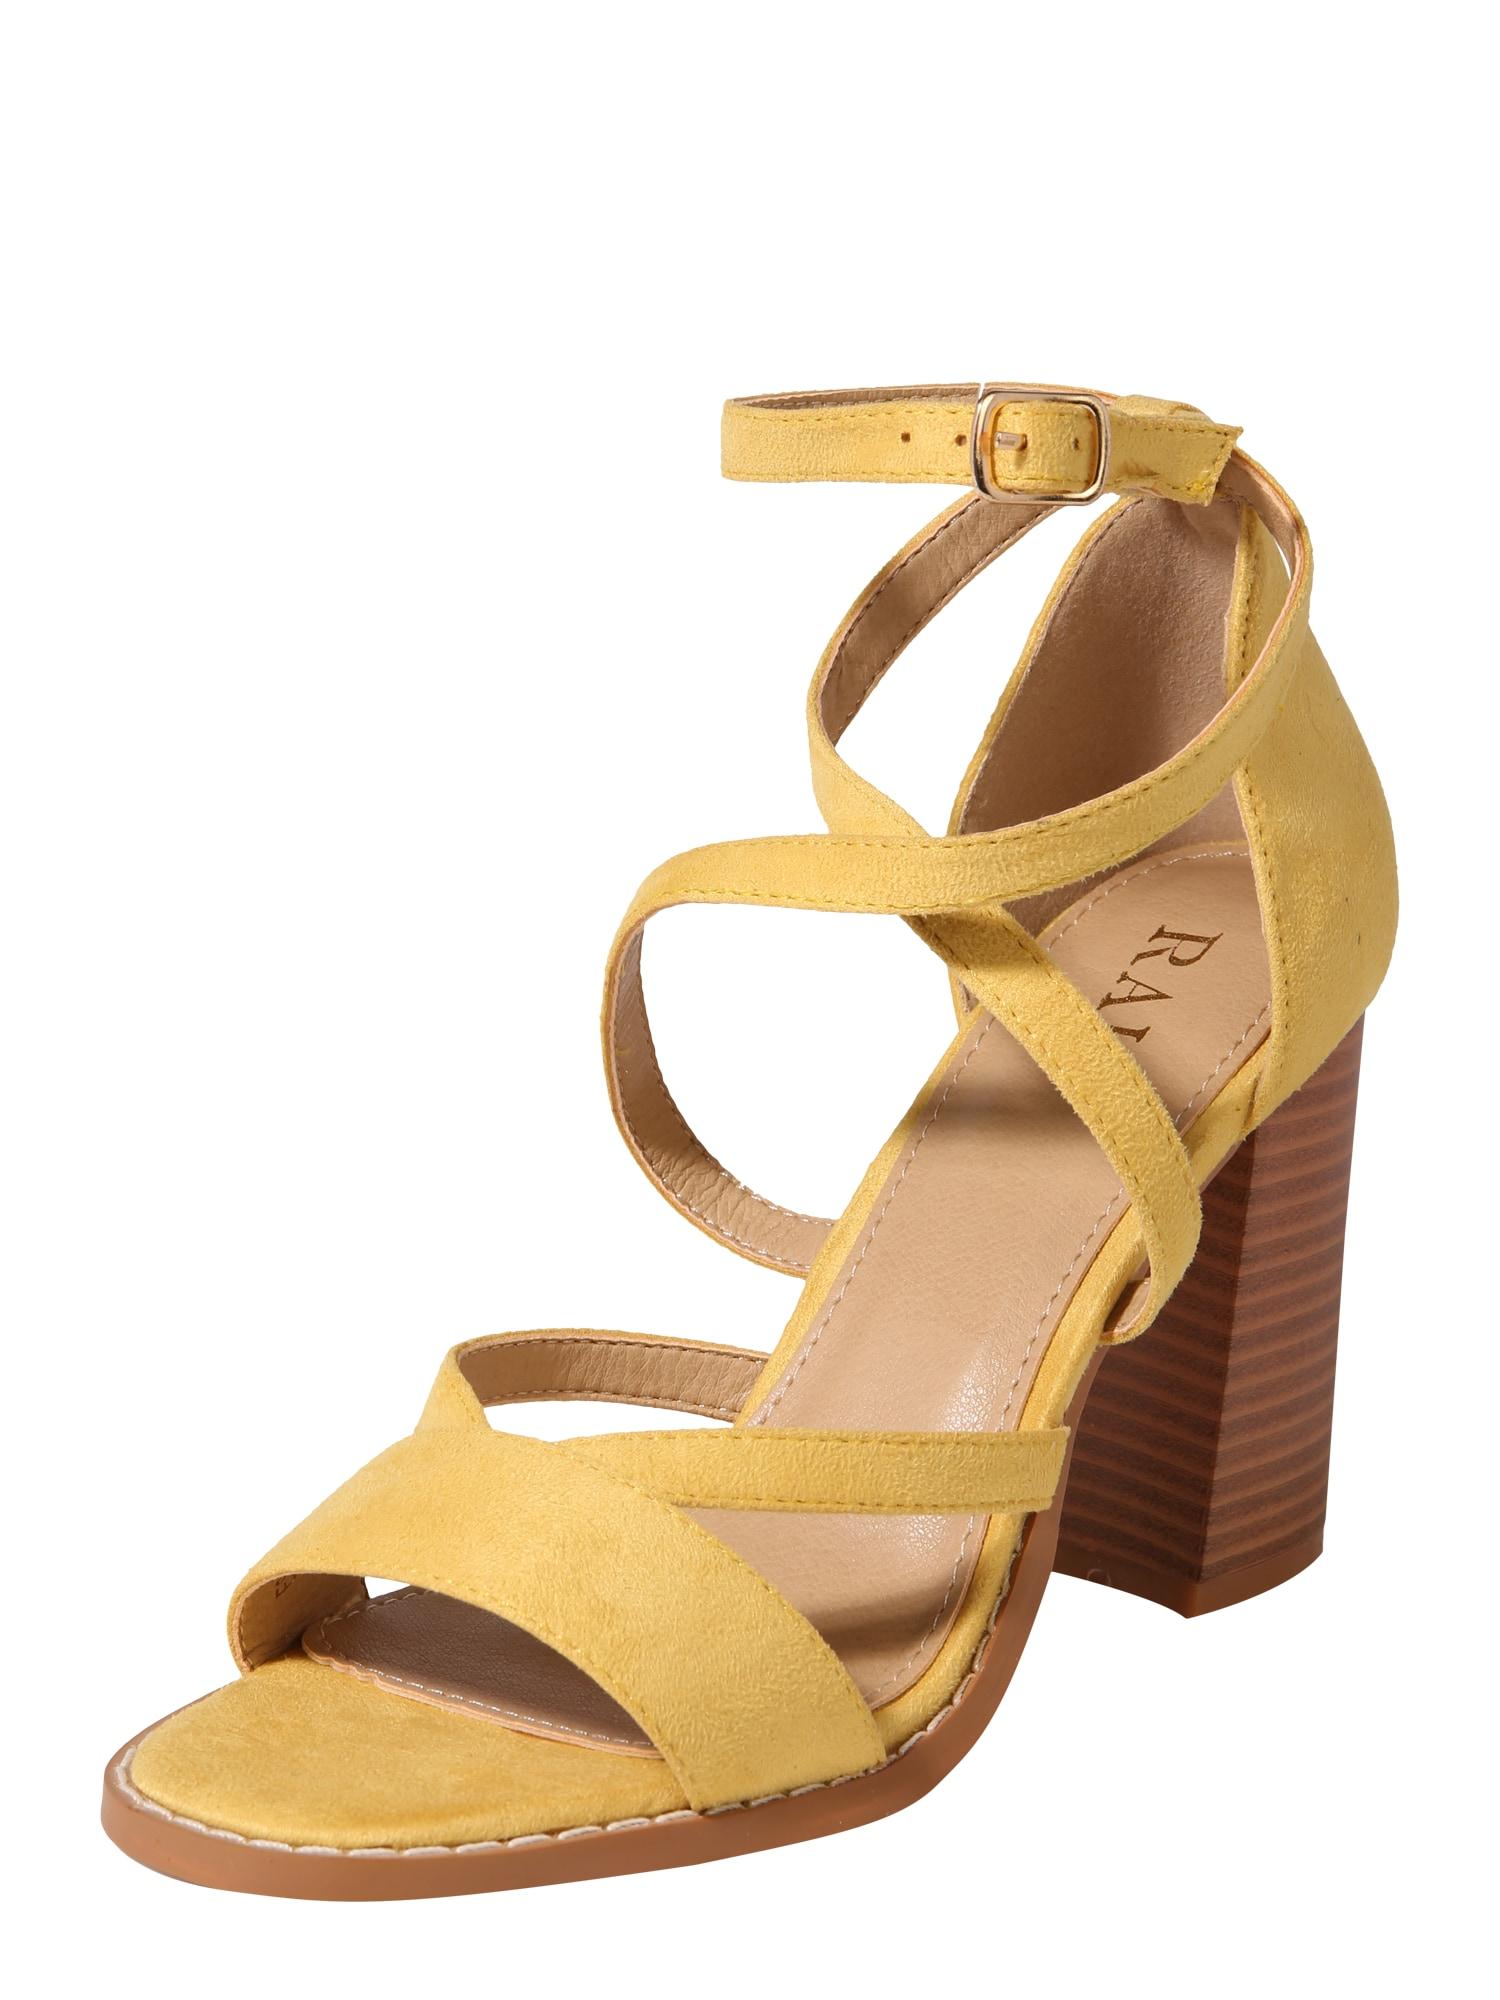 Páskové sandály ESTRELLE-1 světle žlutá Raid